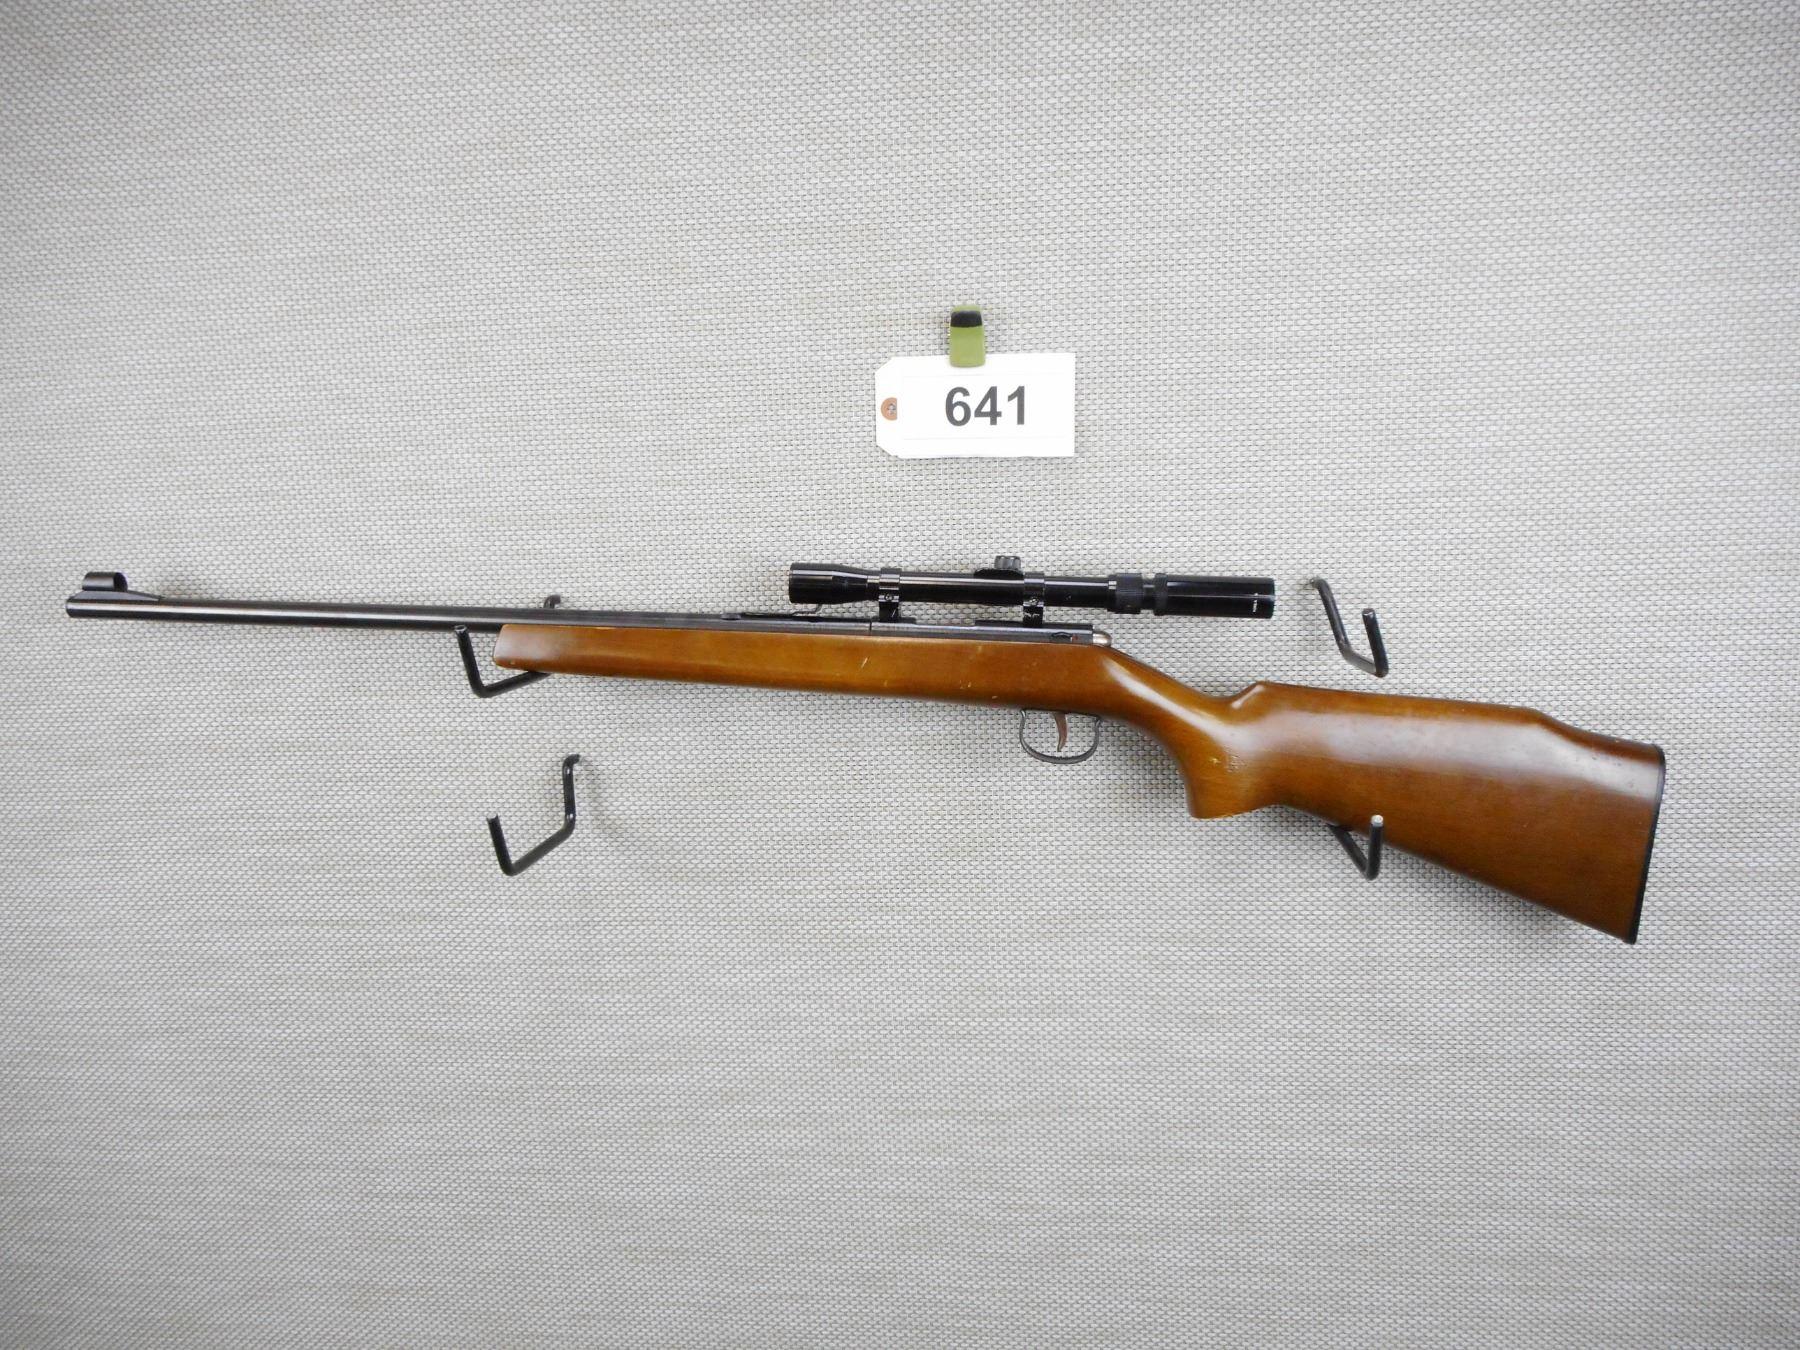 J G  ANSCHUTZ , MODEL: SINGLE SHOT , CALIBER: 22LR